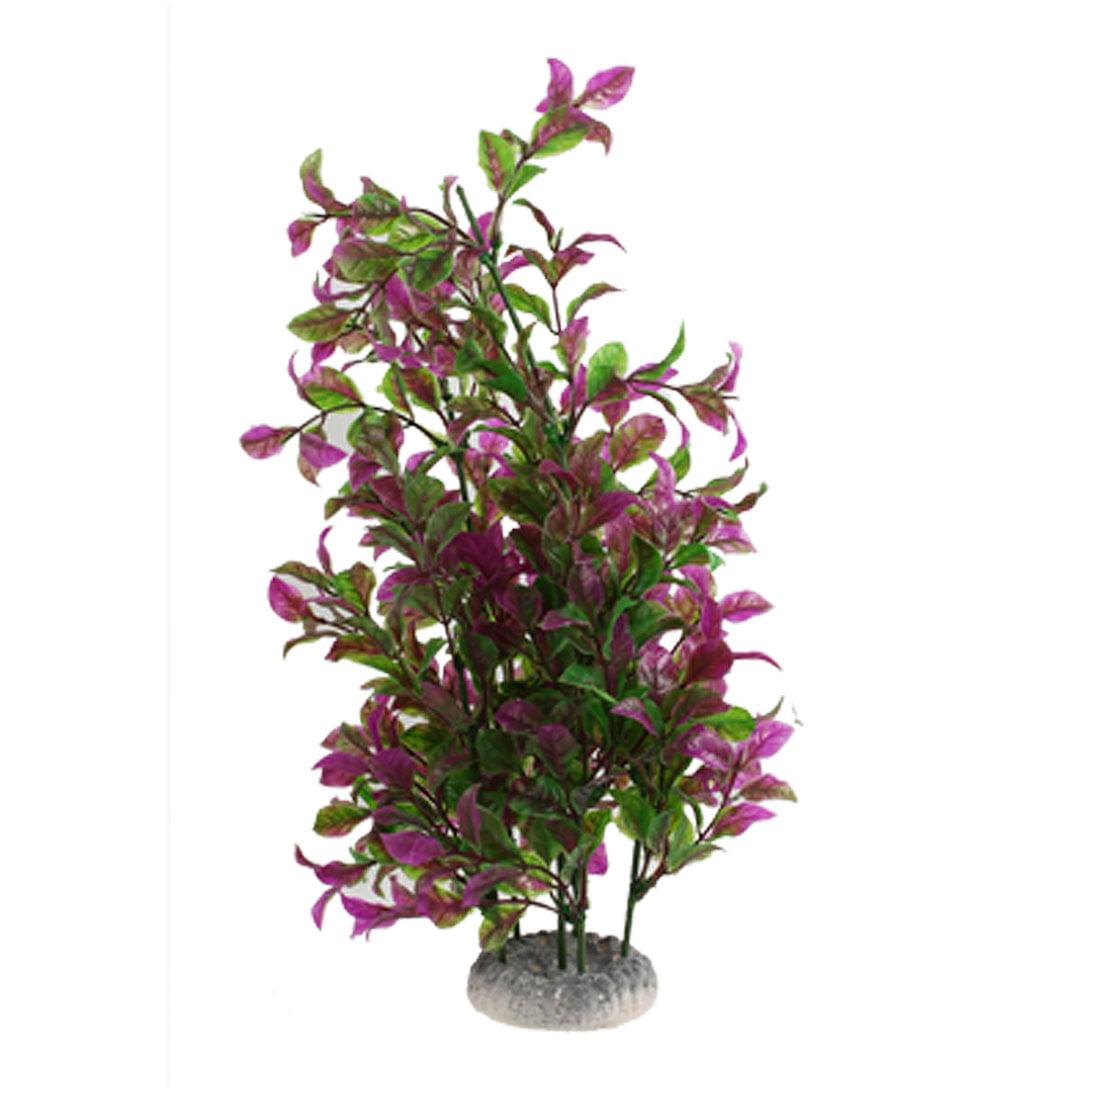 "13"" Height Manmade Plastic Grass Purple Green for Aquarium Decor by"